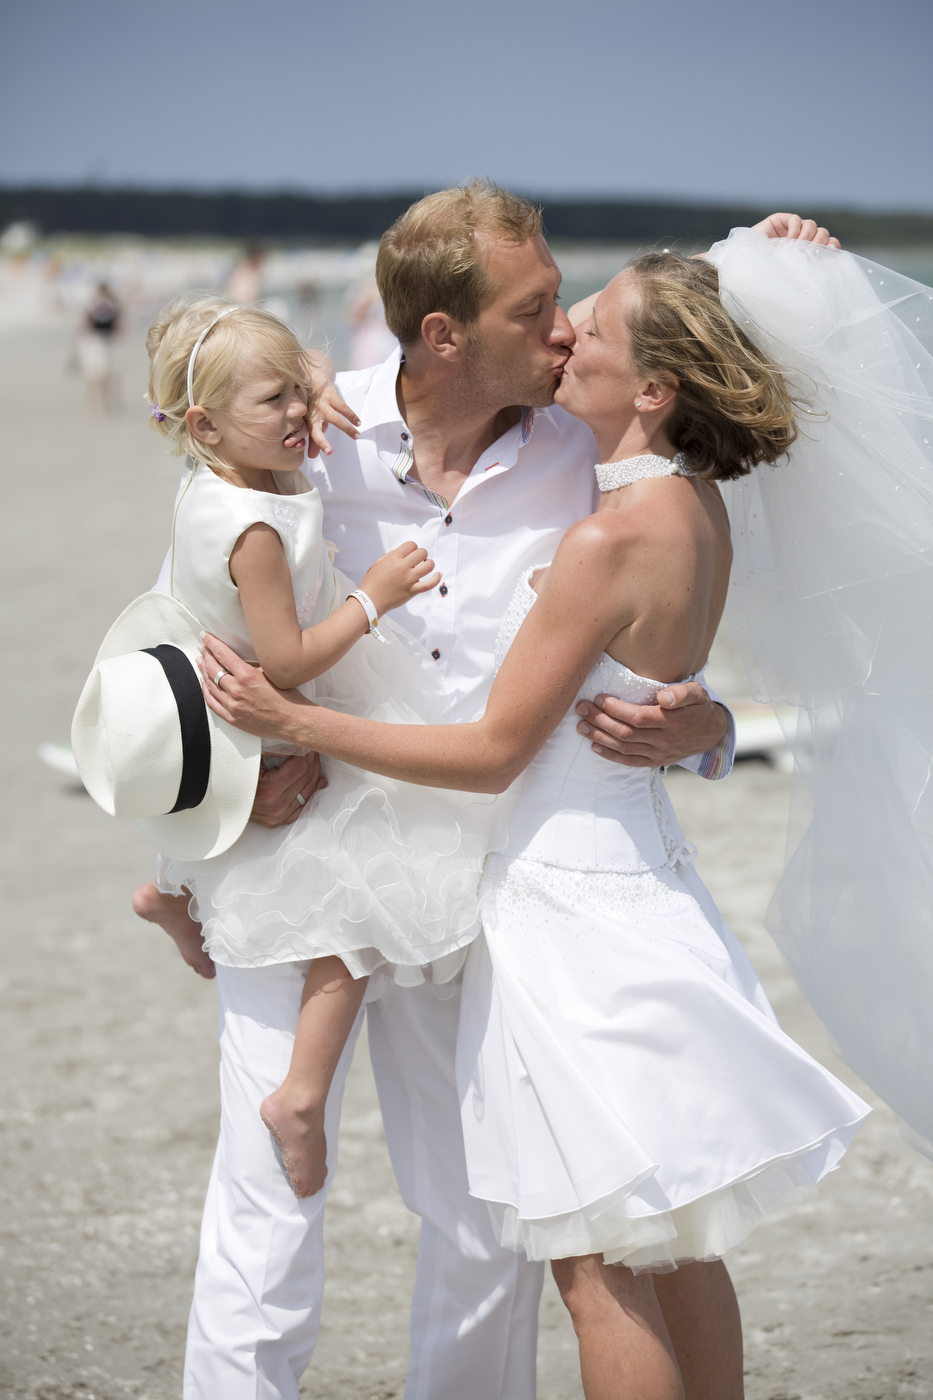 Myrelle Couture Marina Deynega Hochzeit Brautmode Kunden5 04